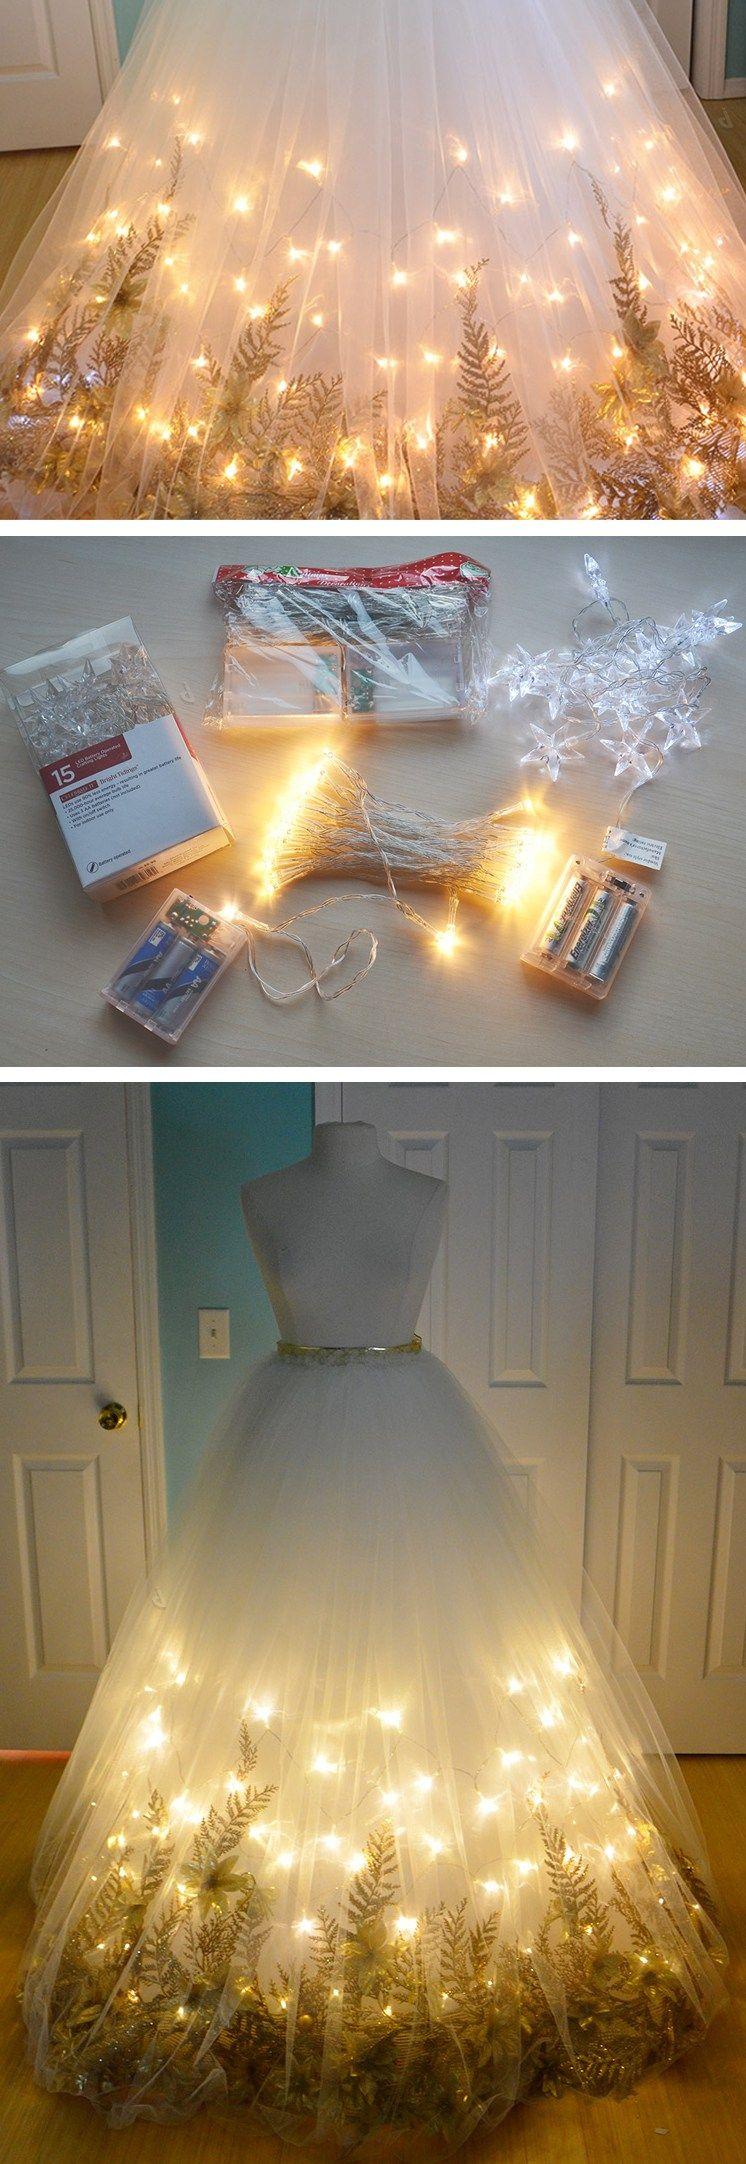 Awesome DIY inspiration: A light up fairy garden tulle maxi dress - DIY light up dress tutorial - Design Intuition